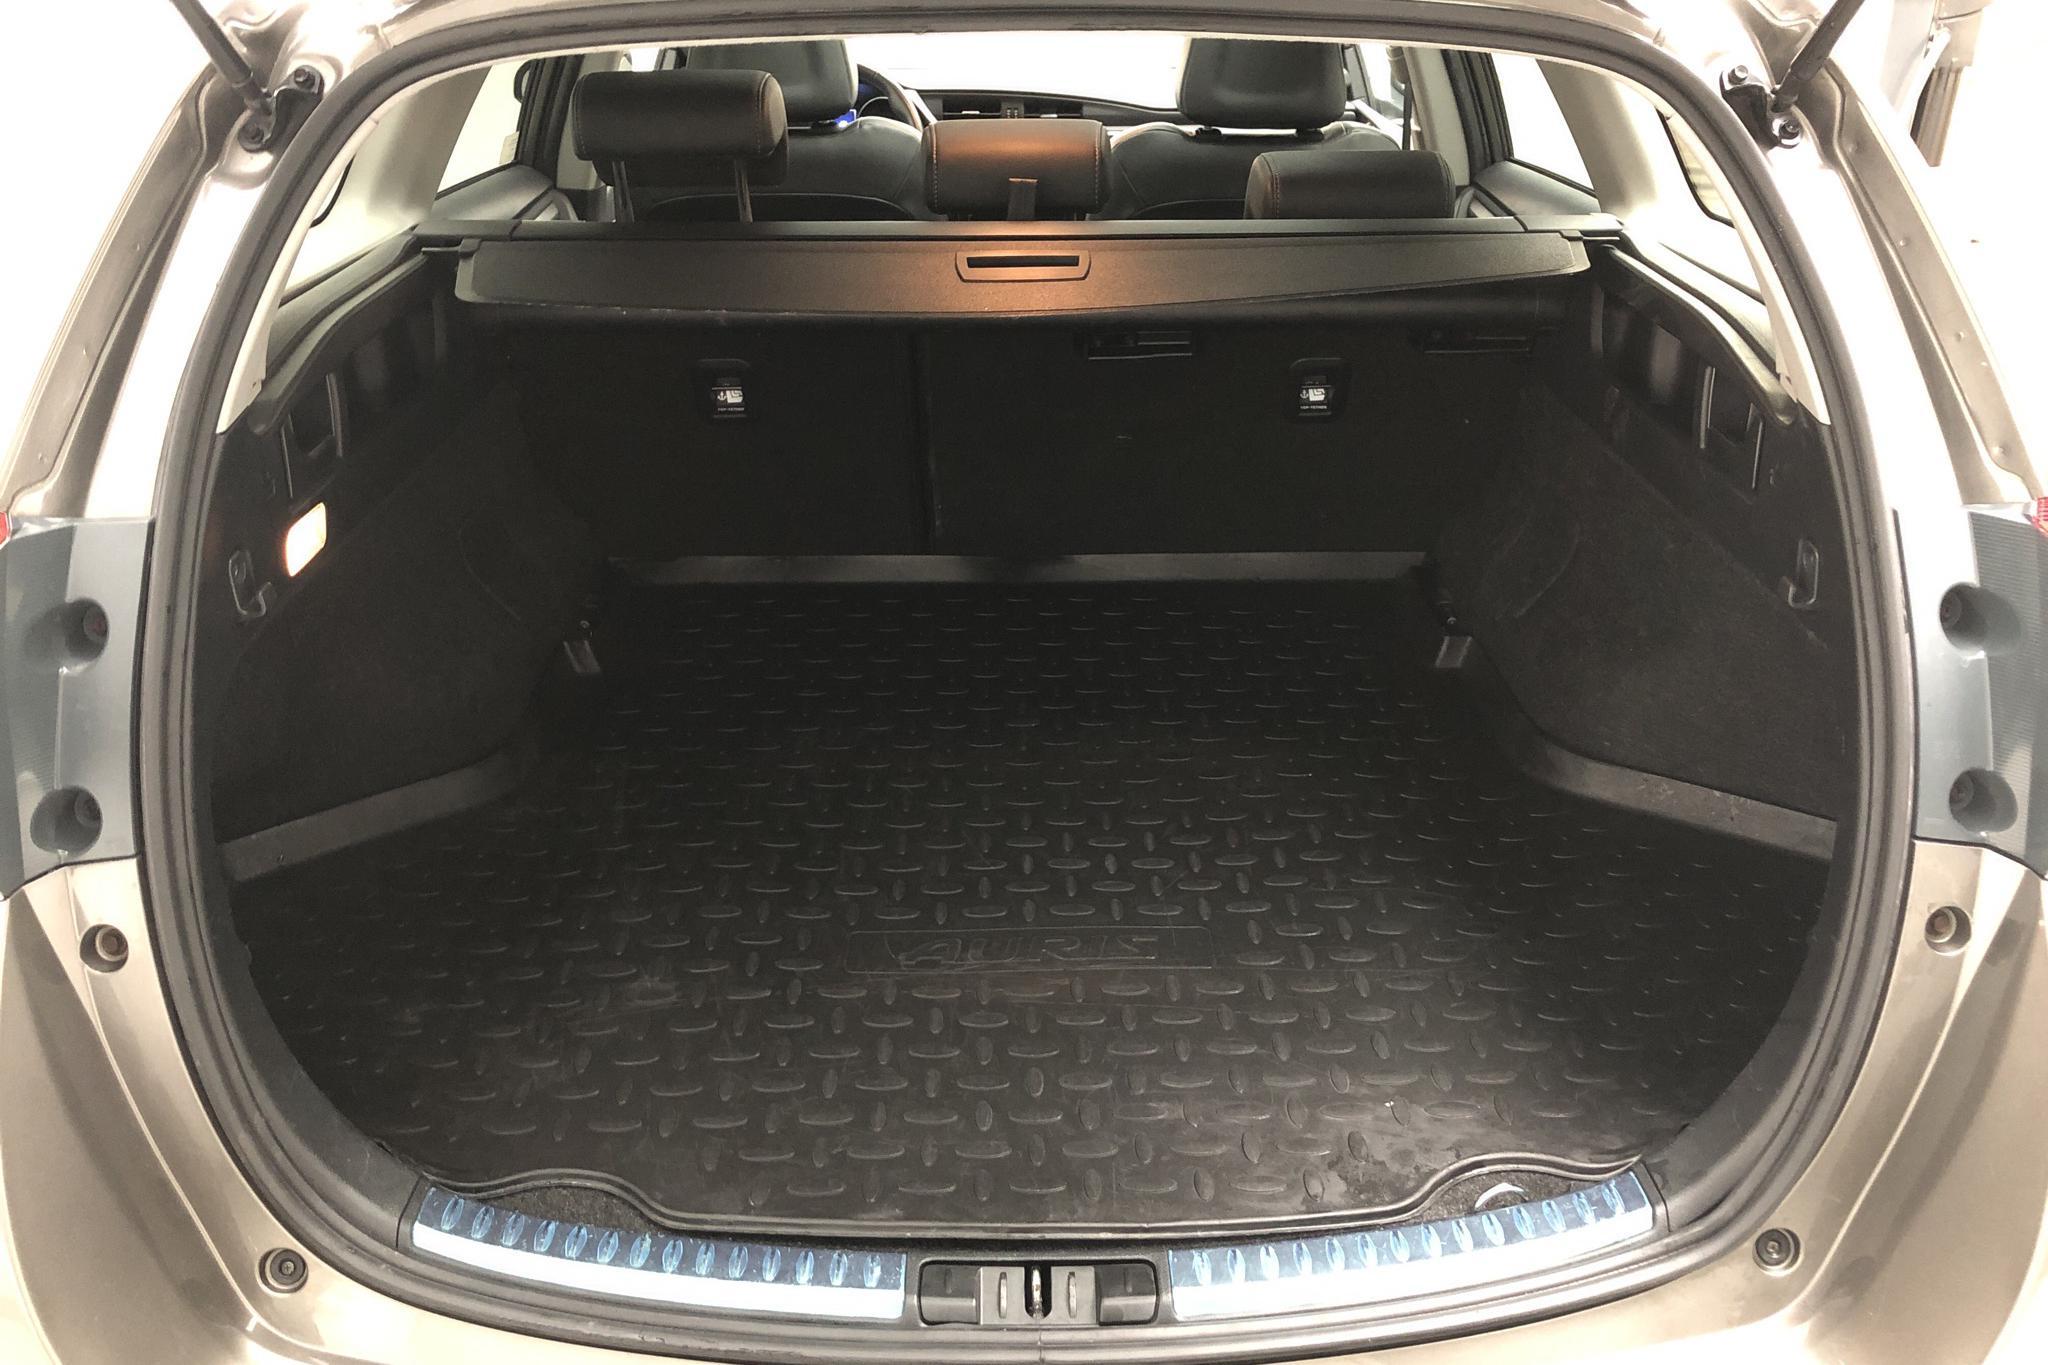 Toyota Auris 1.8 HSD Touring Sports (99hk) - 7 057 mil - Automat - Dark Grey - 2018